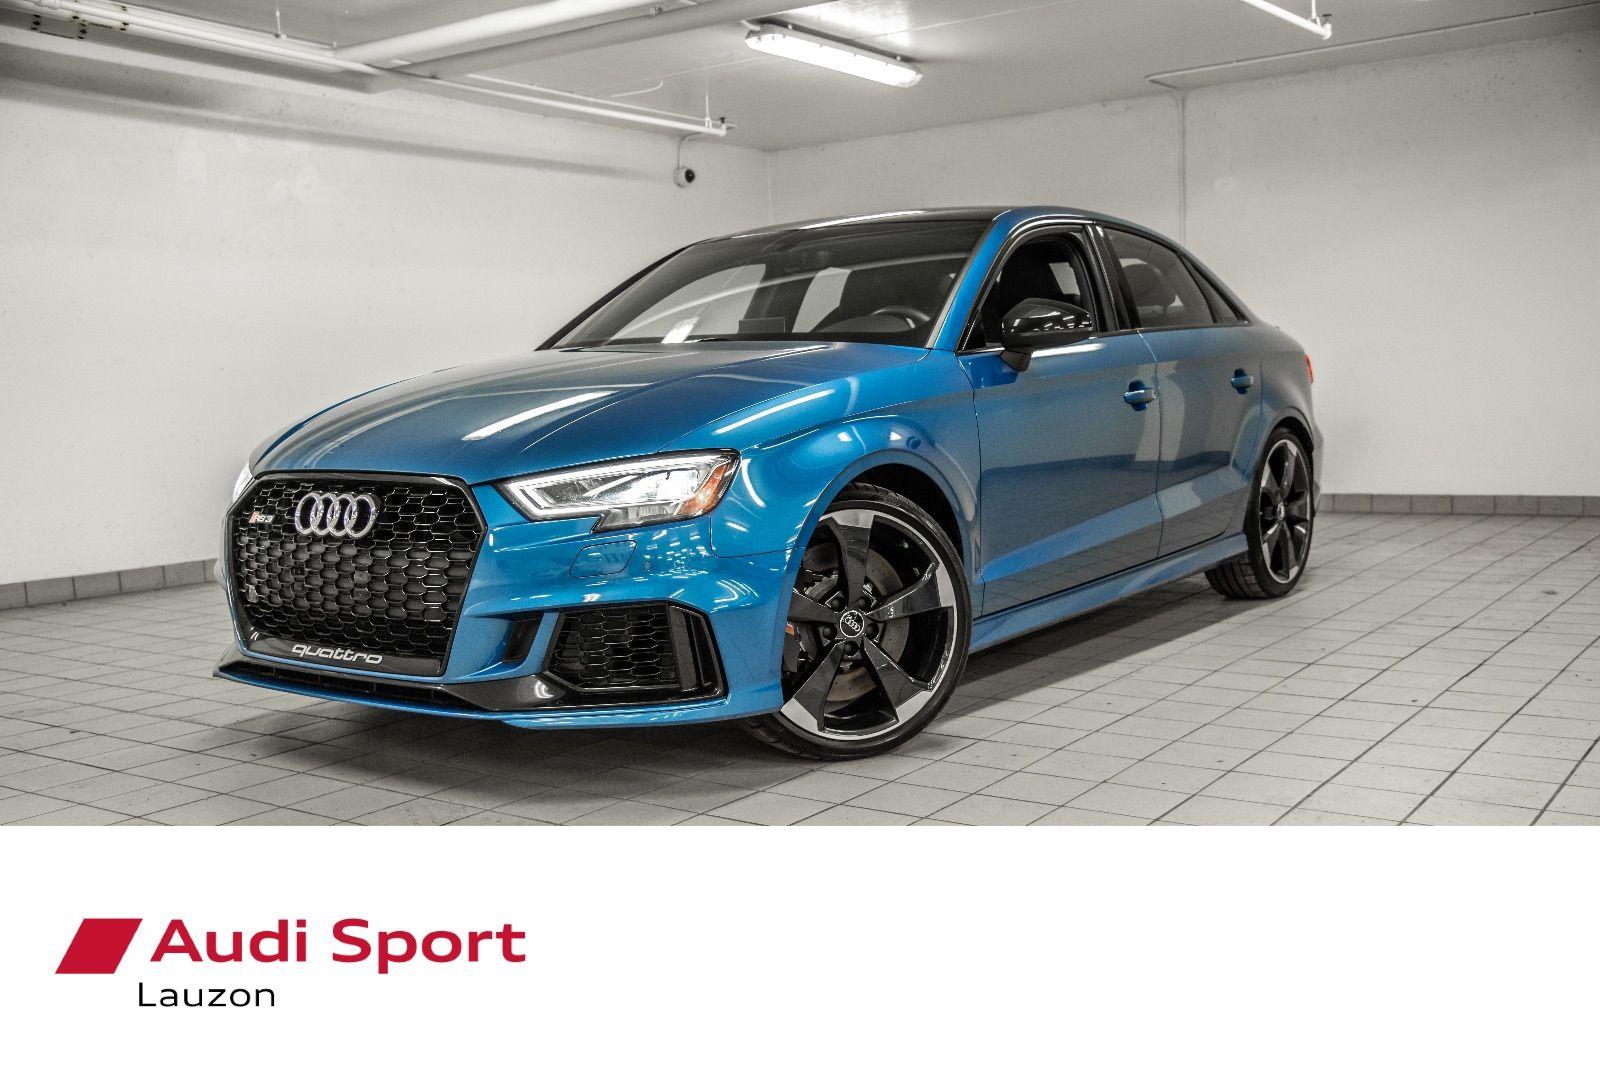 Audi Lauzon Pre Owned 2018 Audi Rs 3 Sedan Black Optics Sport Exhaust 19 Pcs Rotor For Sale In Laval